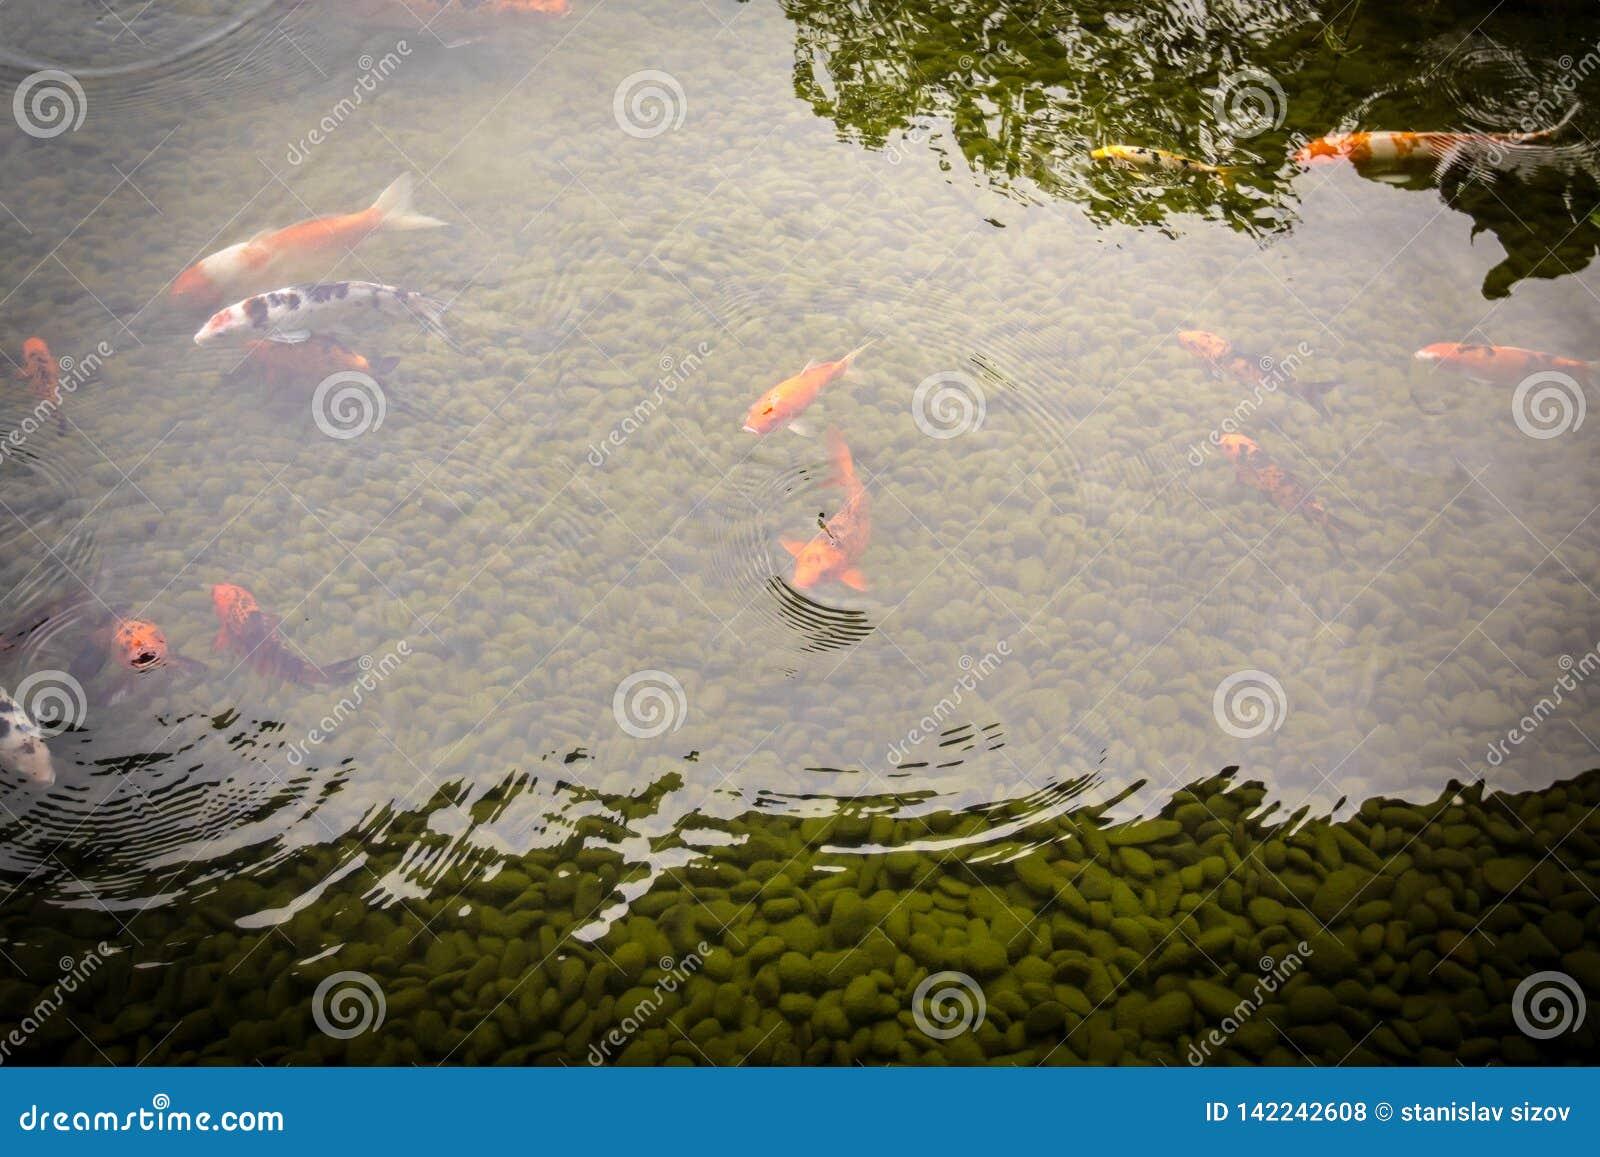 Färgglad coikarpfisk som simmar i dammet